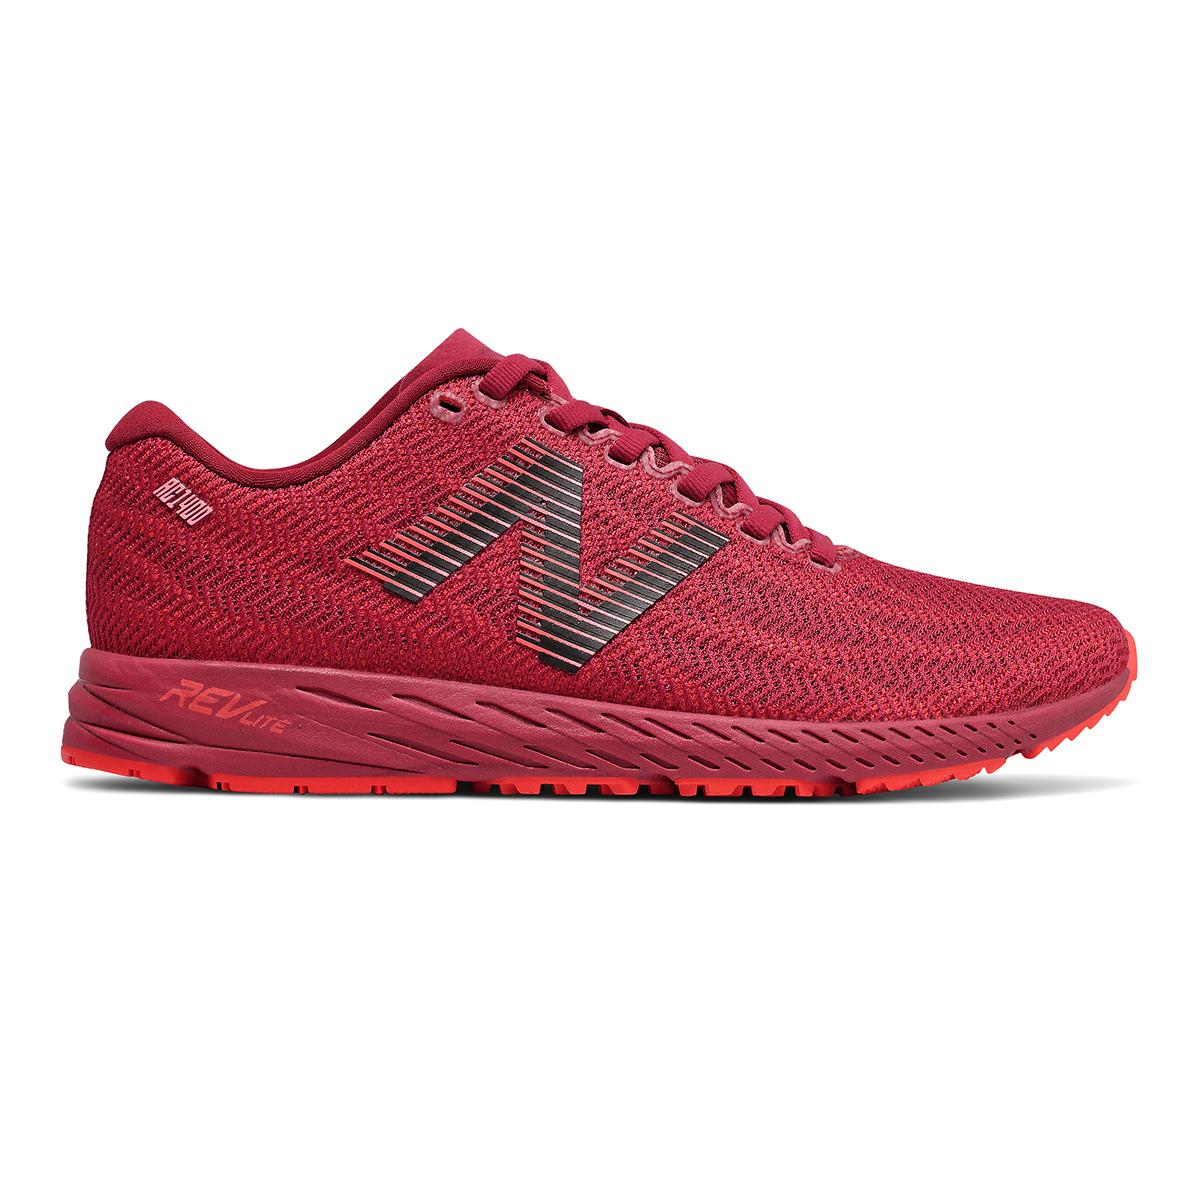 Women's New Balance 1400V6 Running Shoe - Color: Neo Crimson - Size: 5 - Width: Regular, Neo Crimson, large, image 1